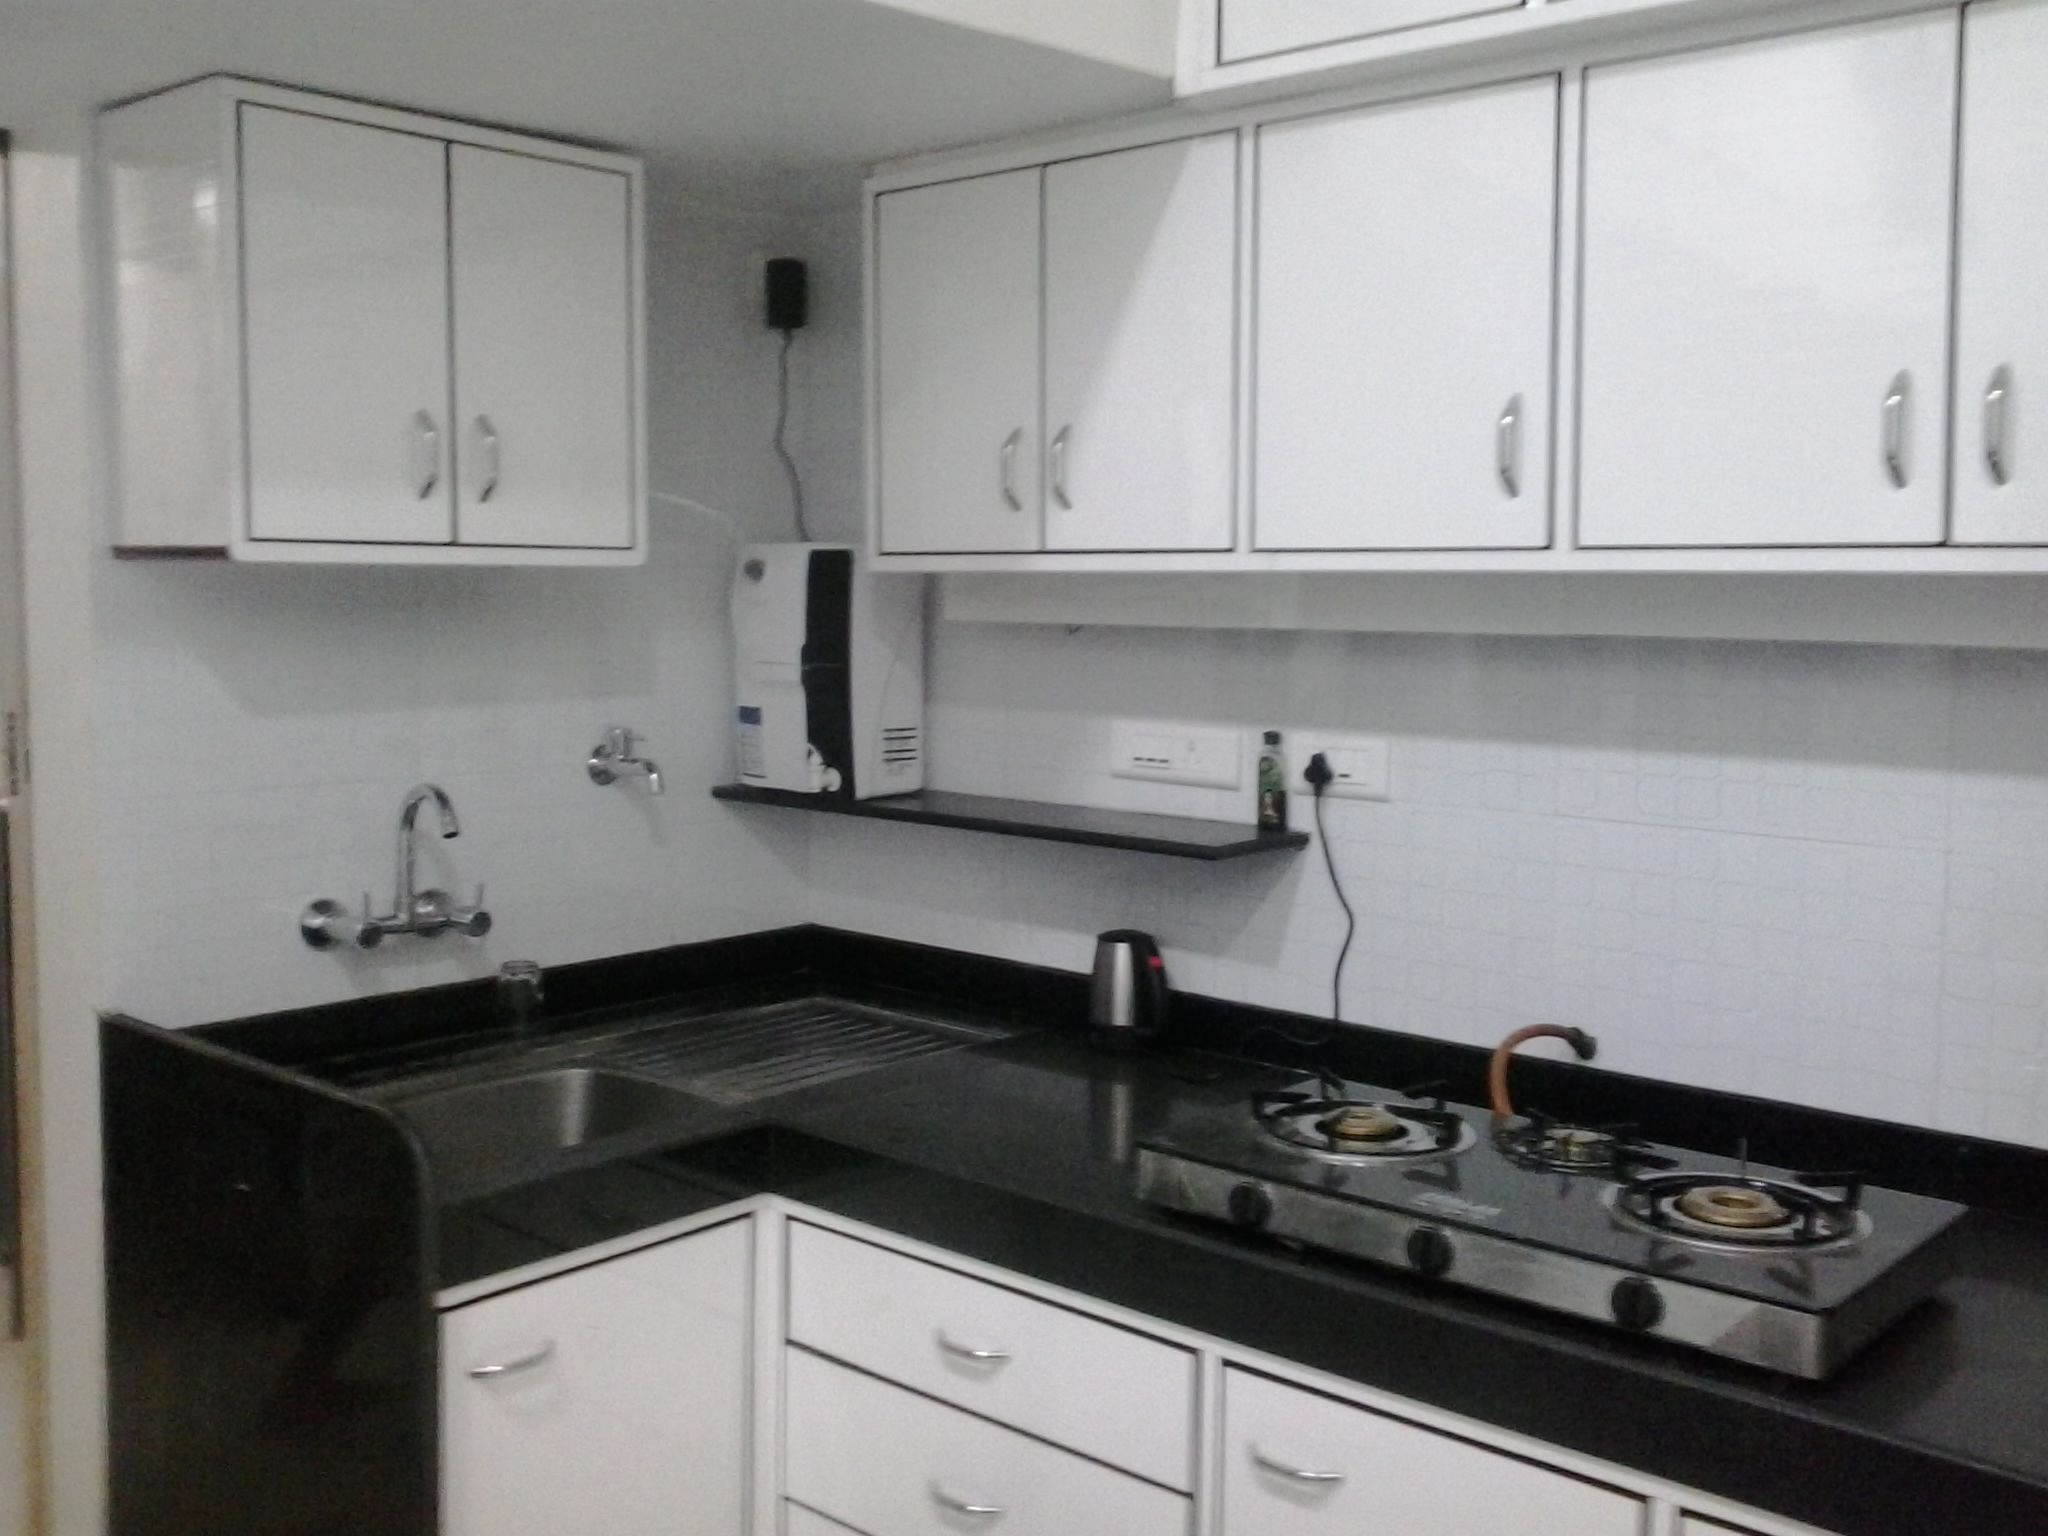 Kitchen Platform Tiles Designs Photo Gallery Home Living Ideas In